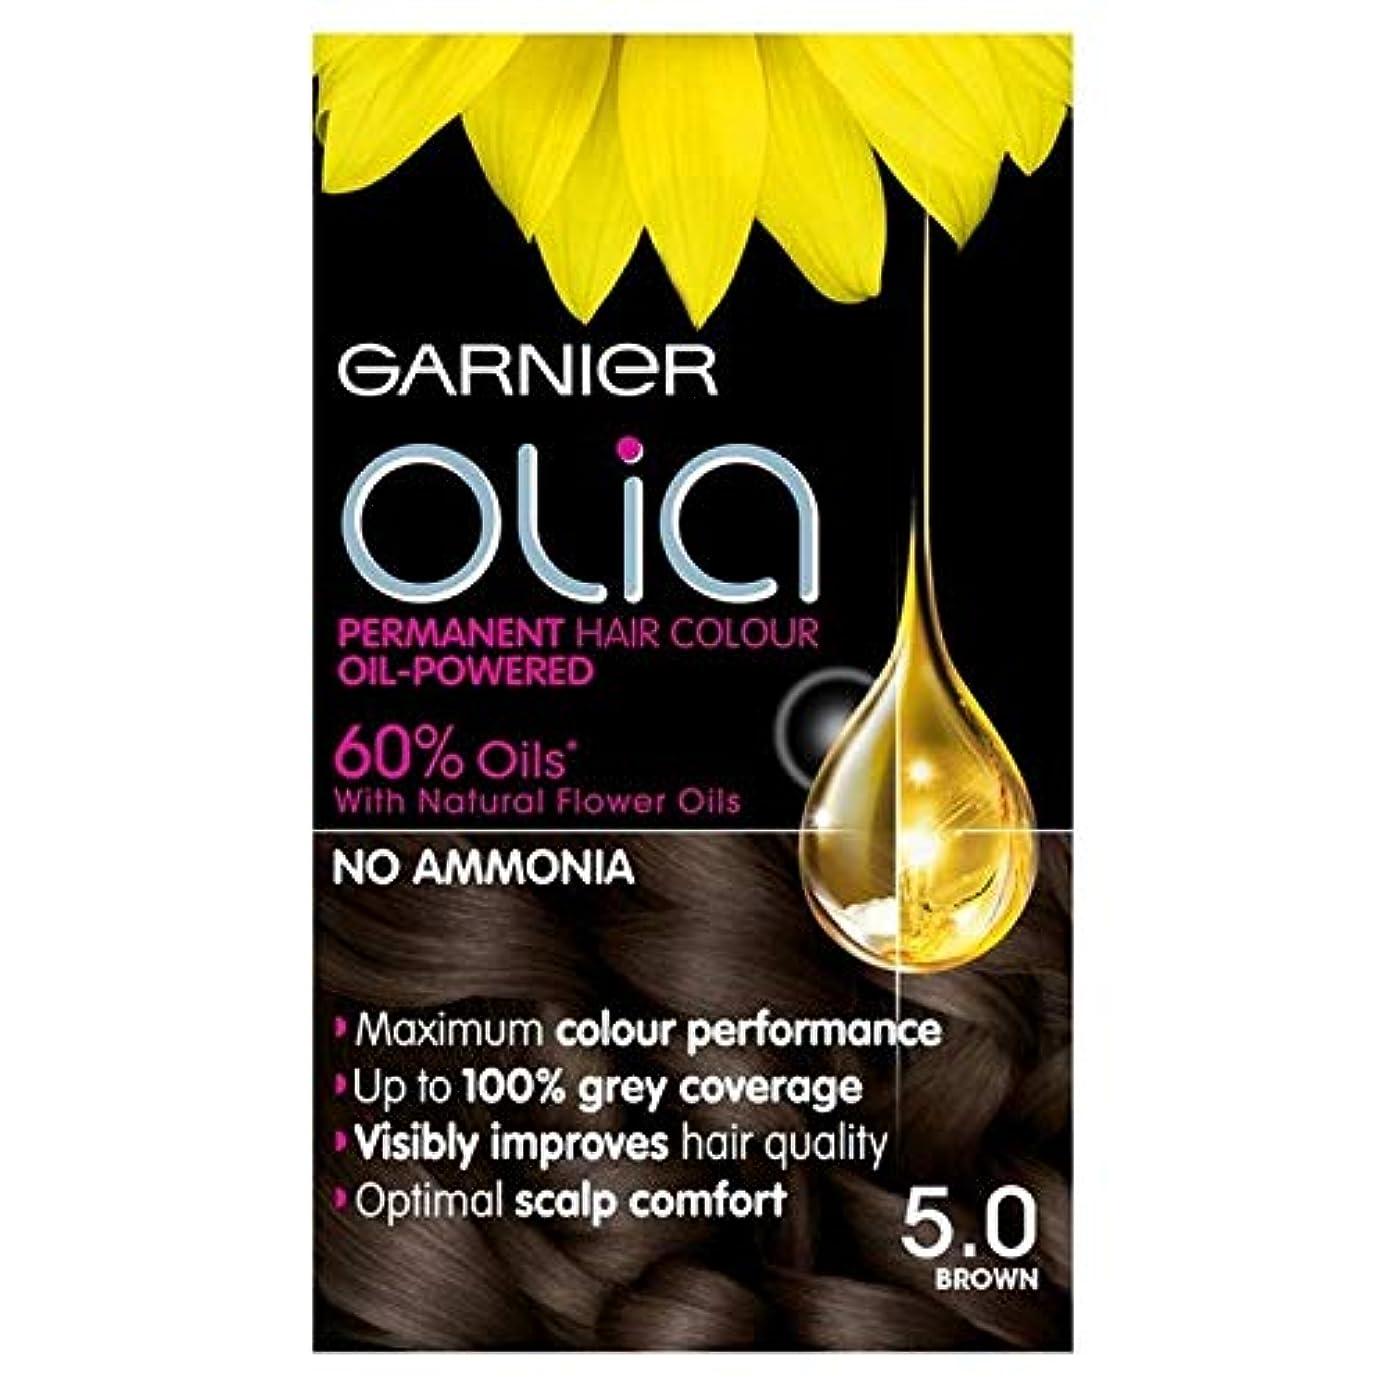 [Garnier ] 5.0茶色の永久染毛剤Oliaガルニエ - Garnier Olia 5.0 Brown Permanent Hair Dye [並行輸入品]